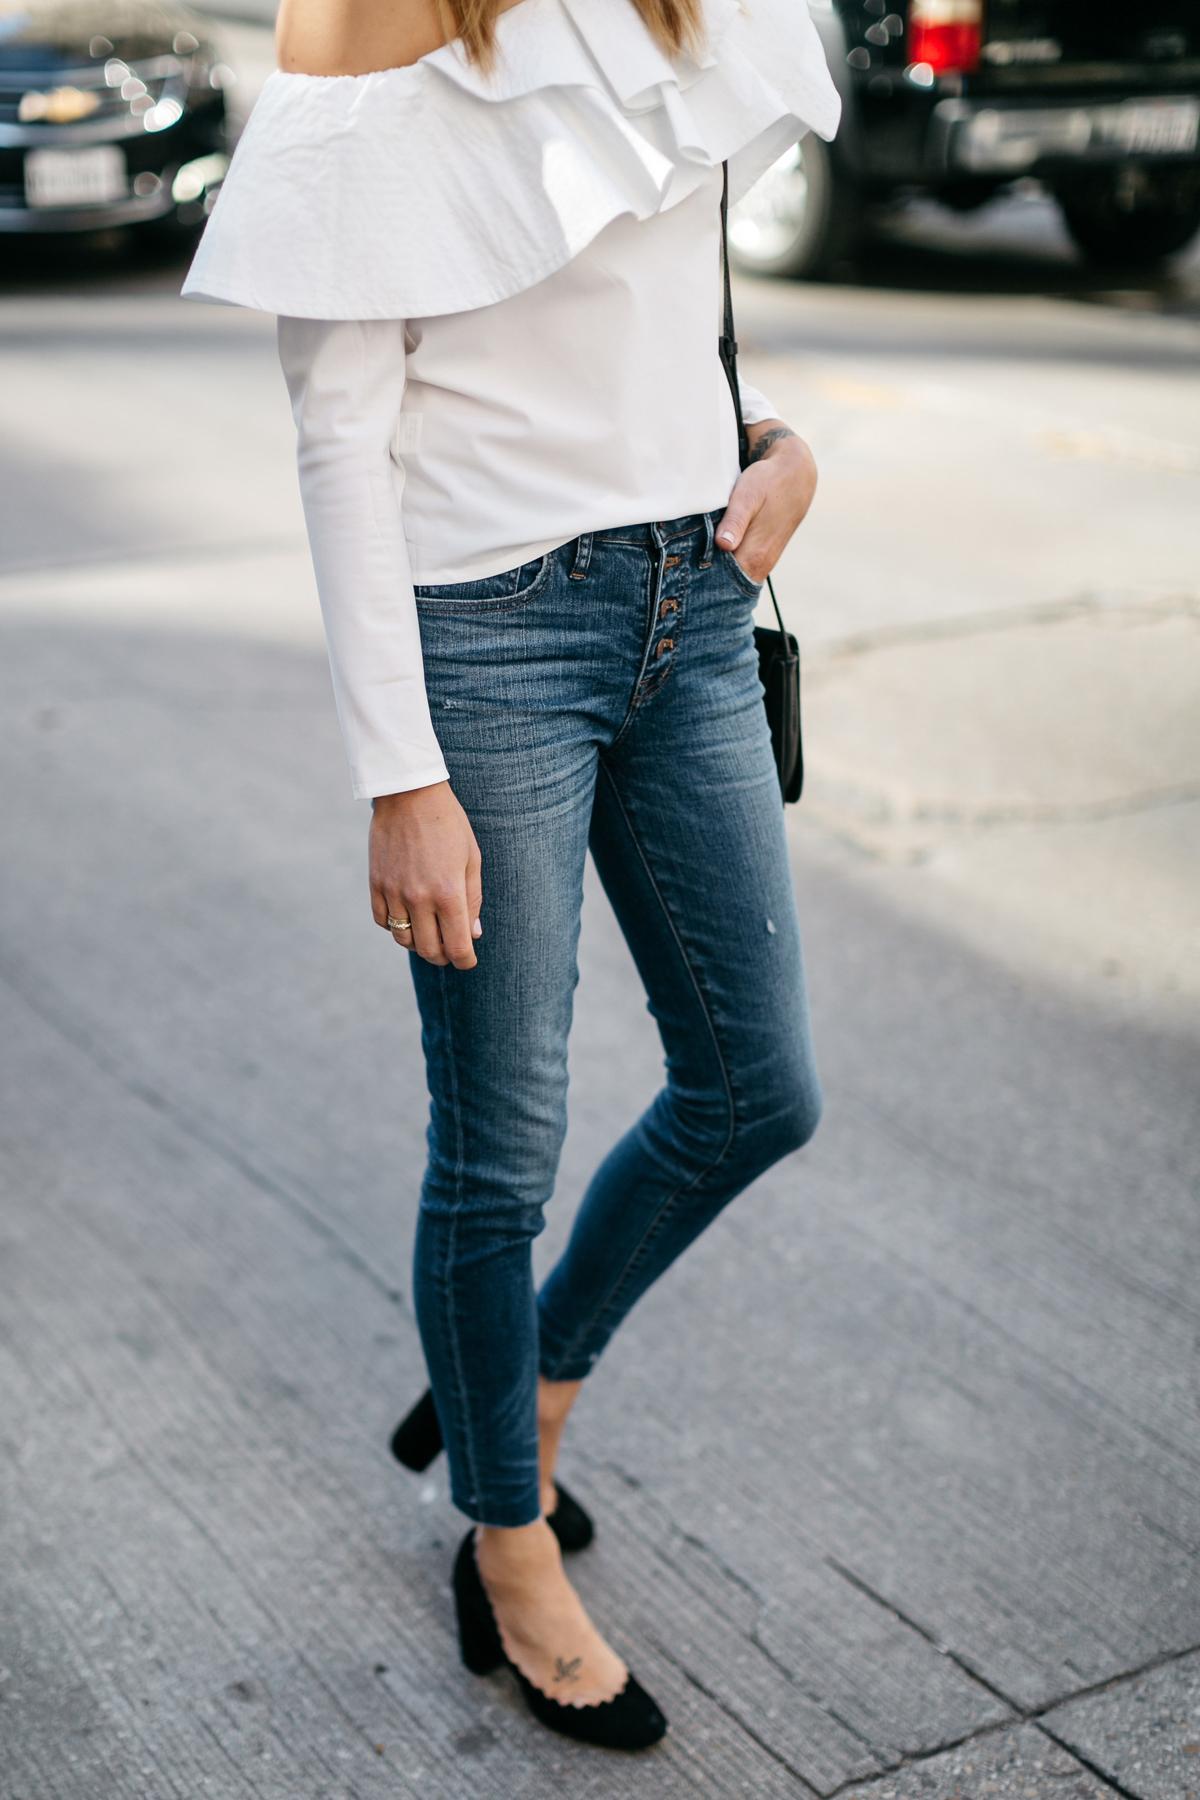 White Ruffle One Shoulder Top, Button Fly Jeans, Chloe Faye Handbag, Chloe Lauren Pumps, Fashion Jackson, Street Style Fashion